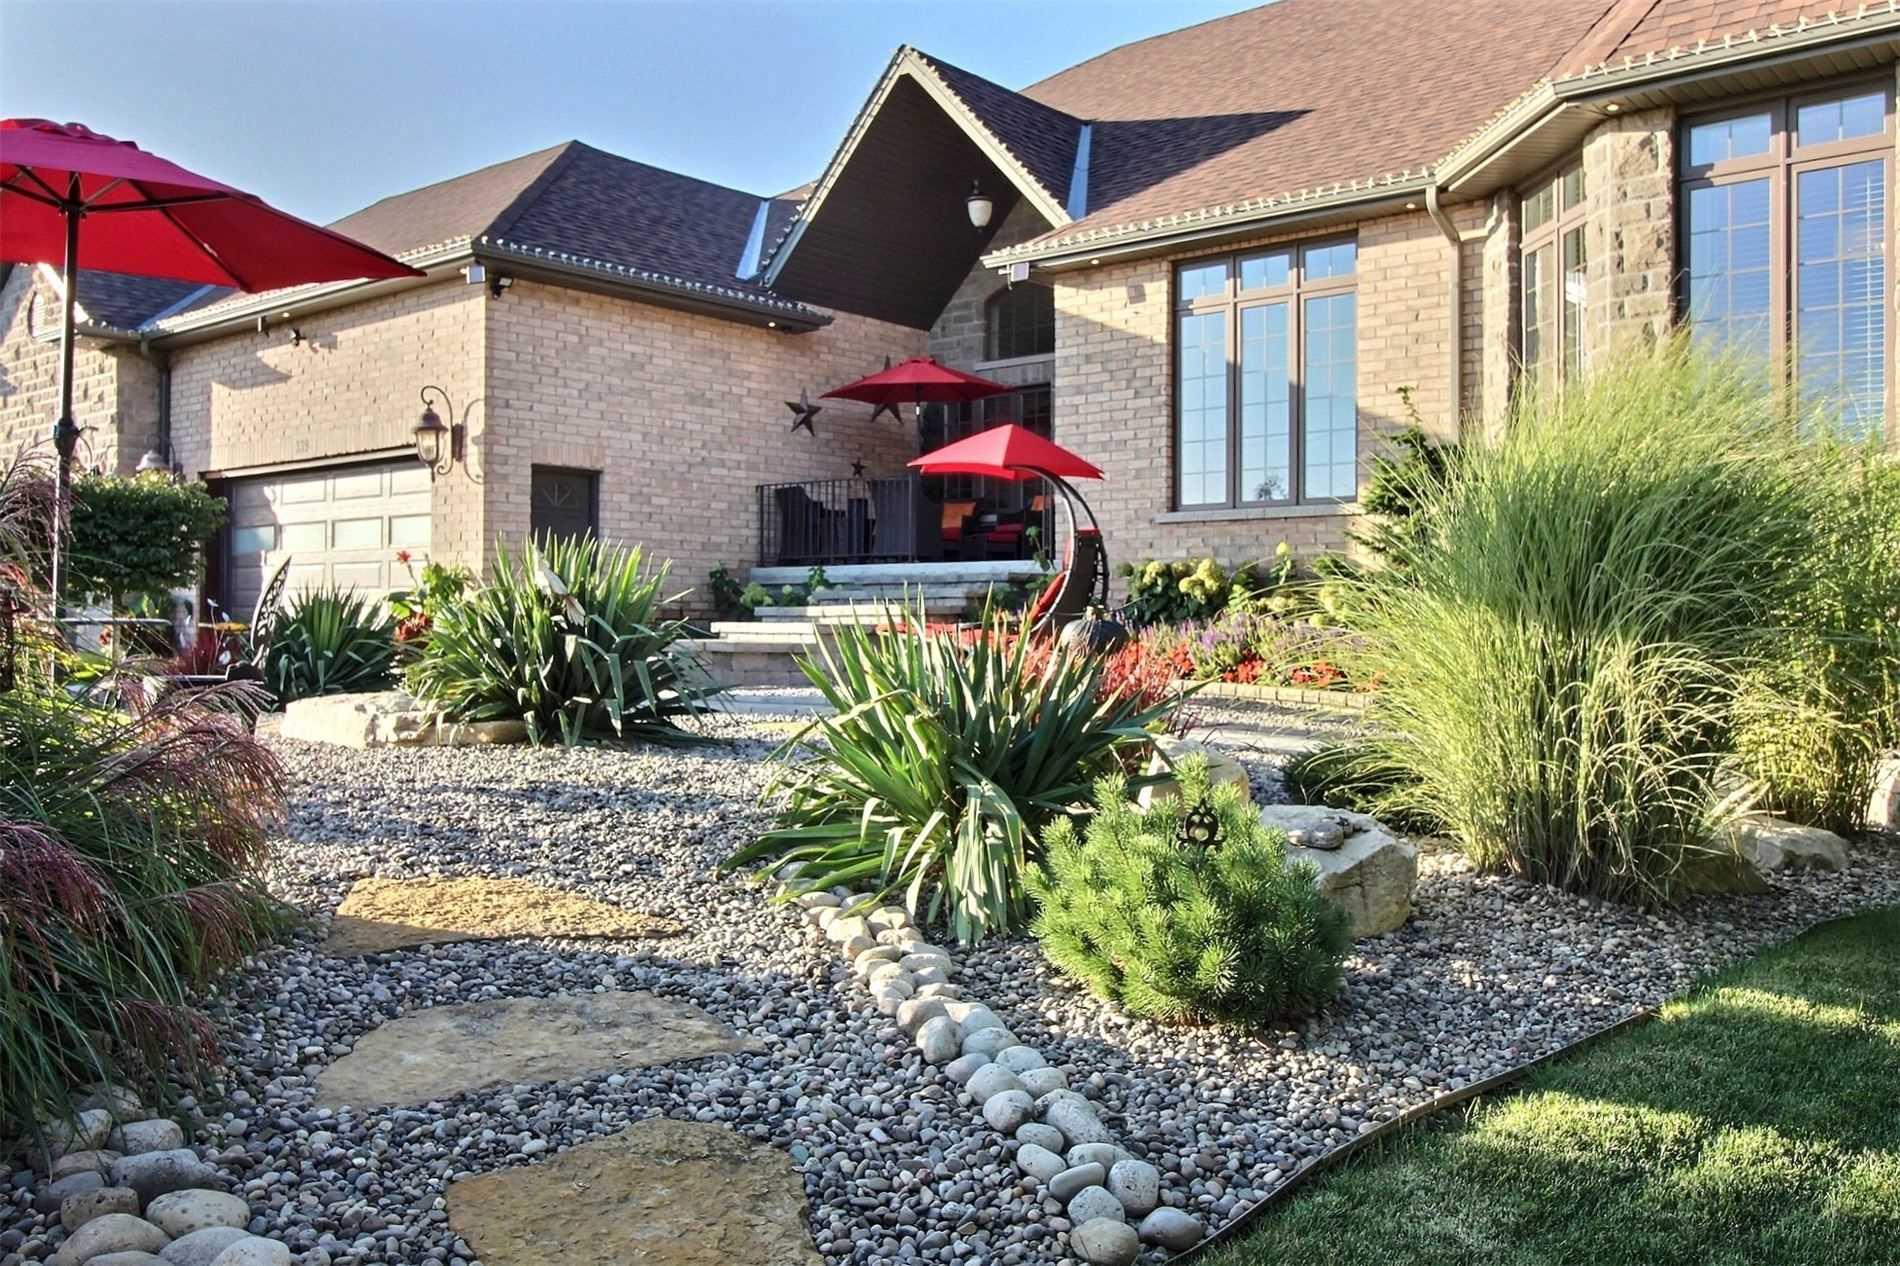 Detached house For Sale In Hamilton - 339 Highland Rd, Hamilton, Ontario, Canada L8J 3E7 , 3 Bedrooms Bedrooms, ,4 BathroomsBathrooms,Detached,For Sale,Highland